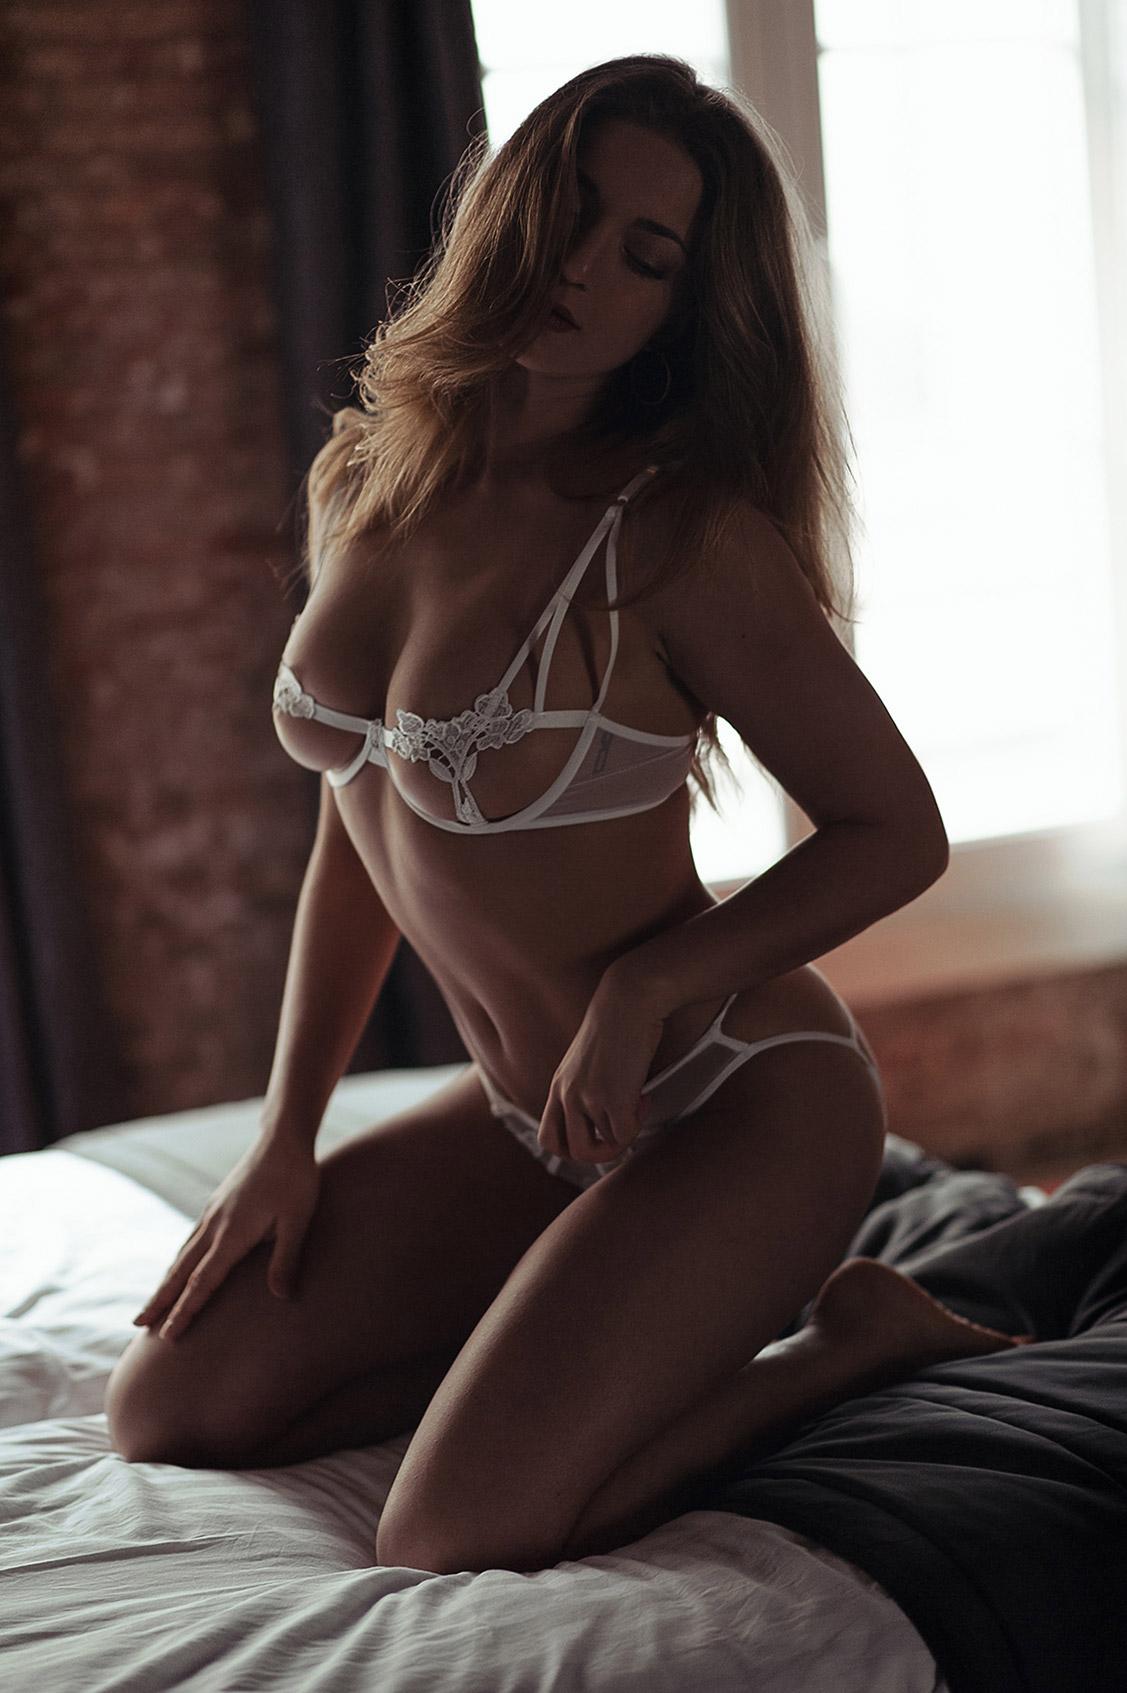 Pure Beauty / Nicola Wills by Massimo Leonardi - Yume Magazine